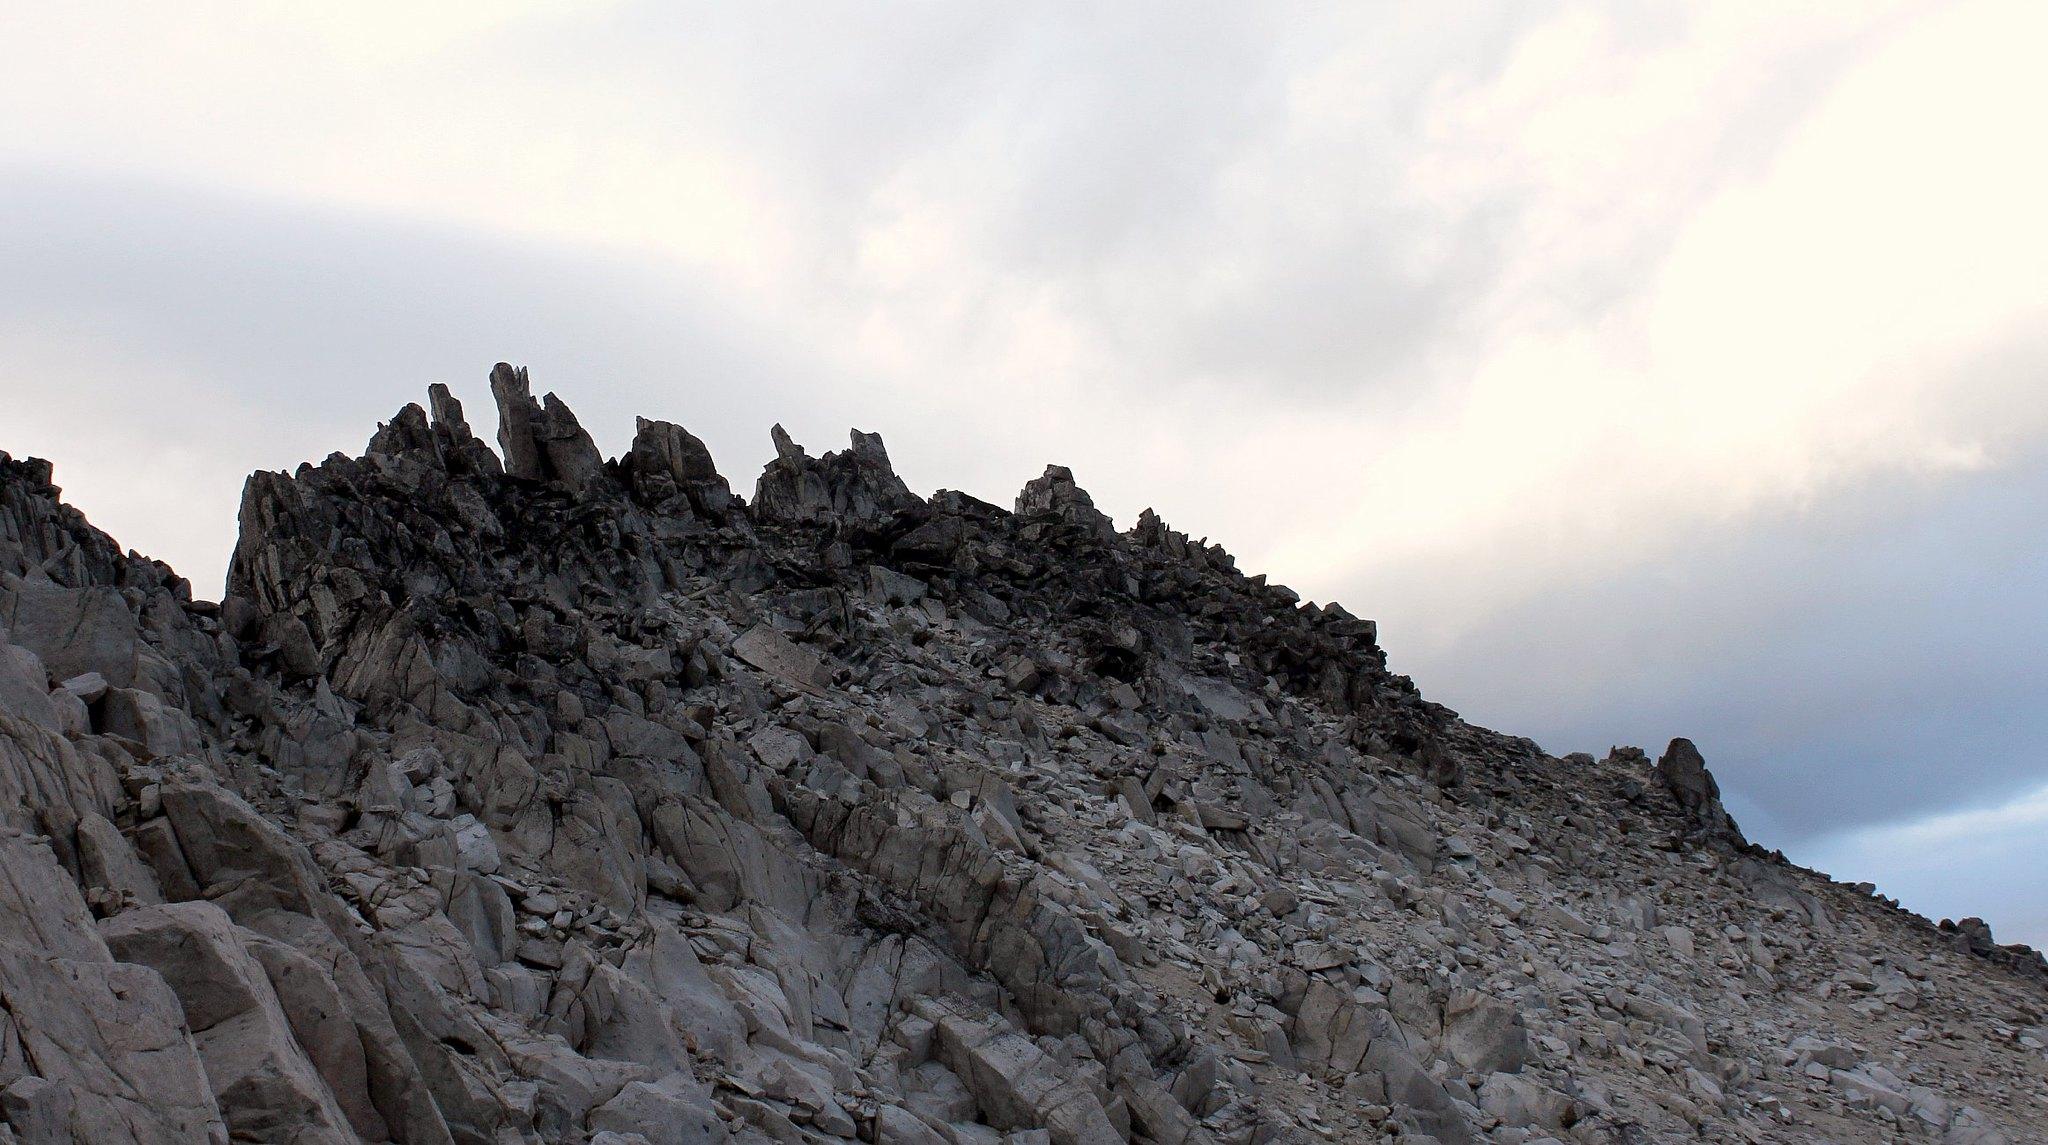 Scrambling up toward the summit